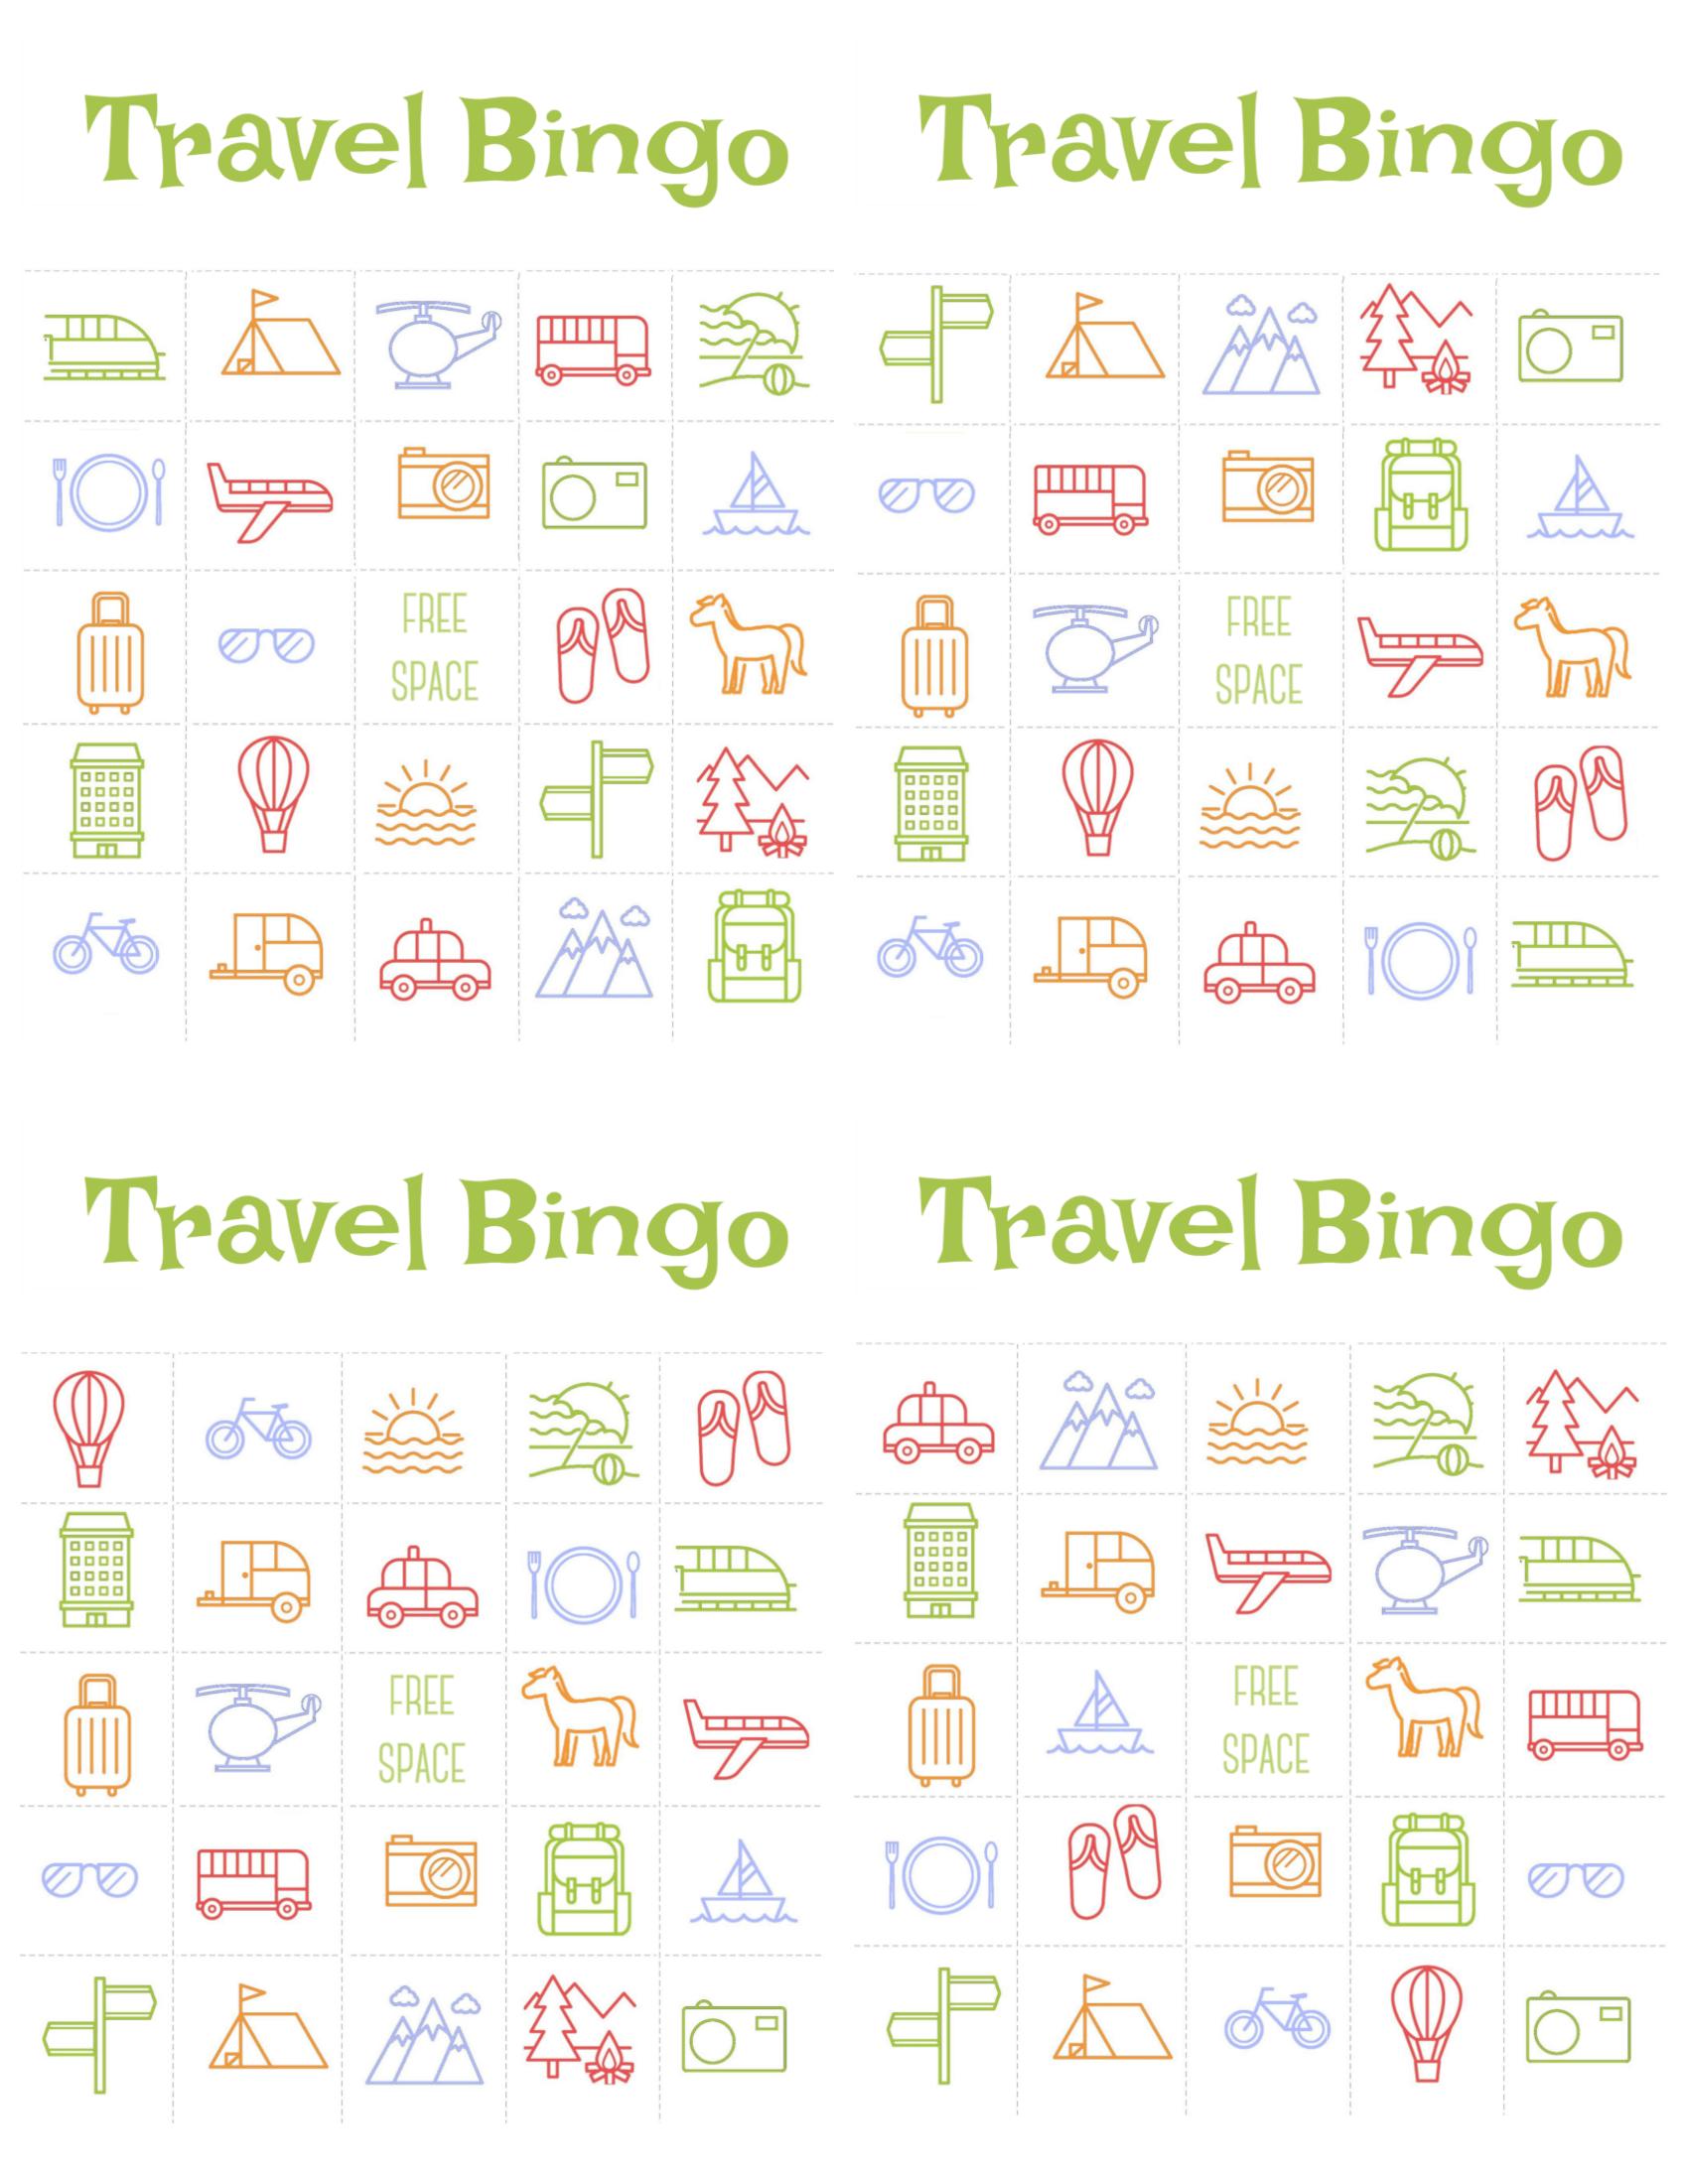 Travel Bingo Cards That Are Juicy